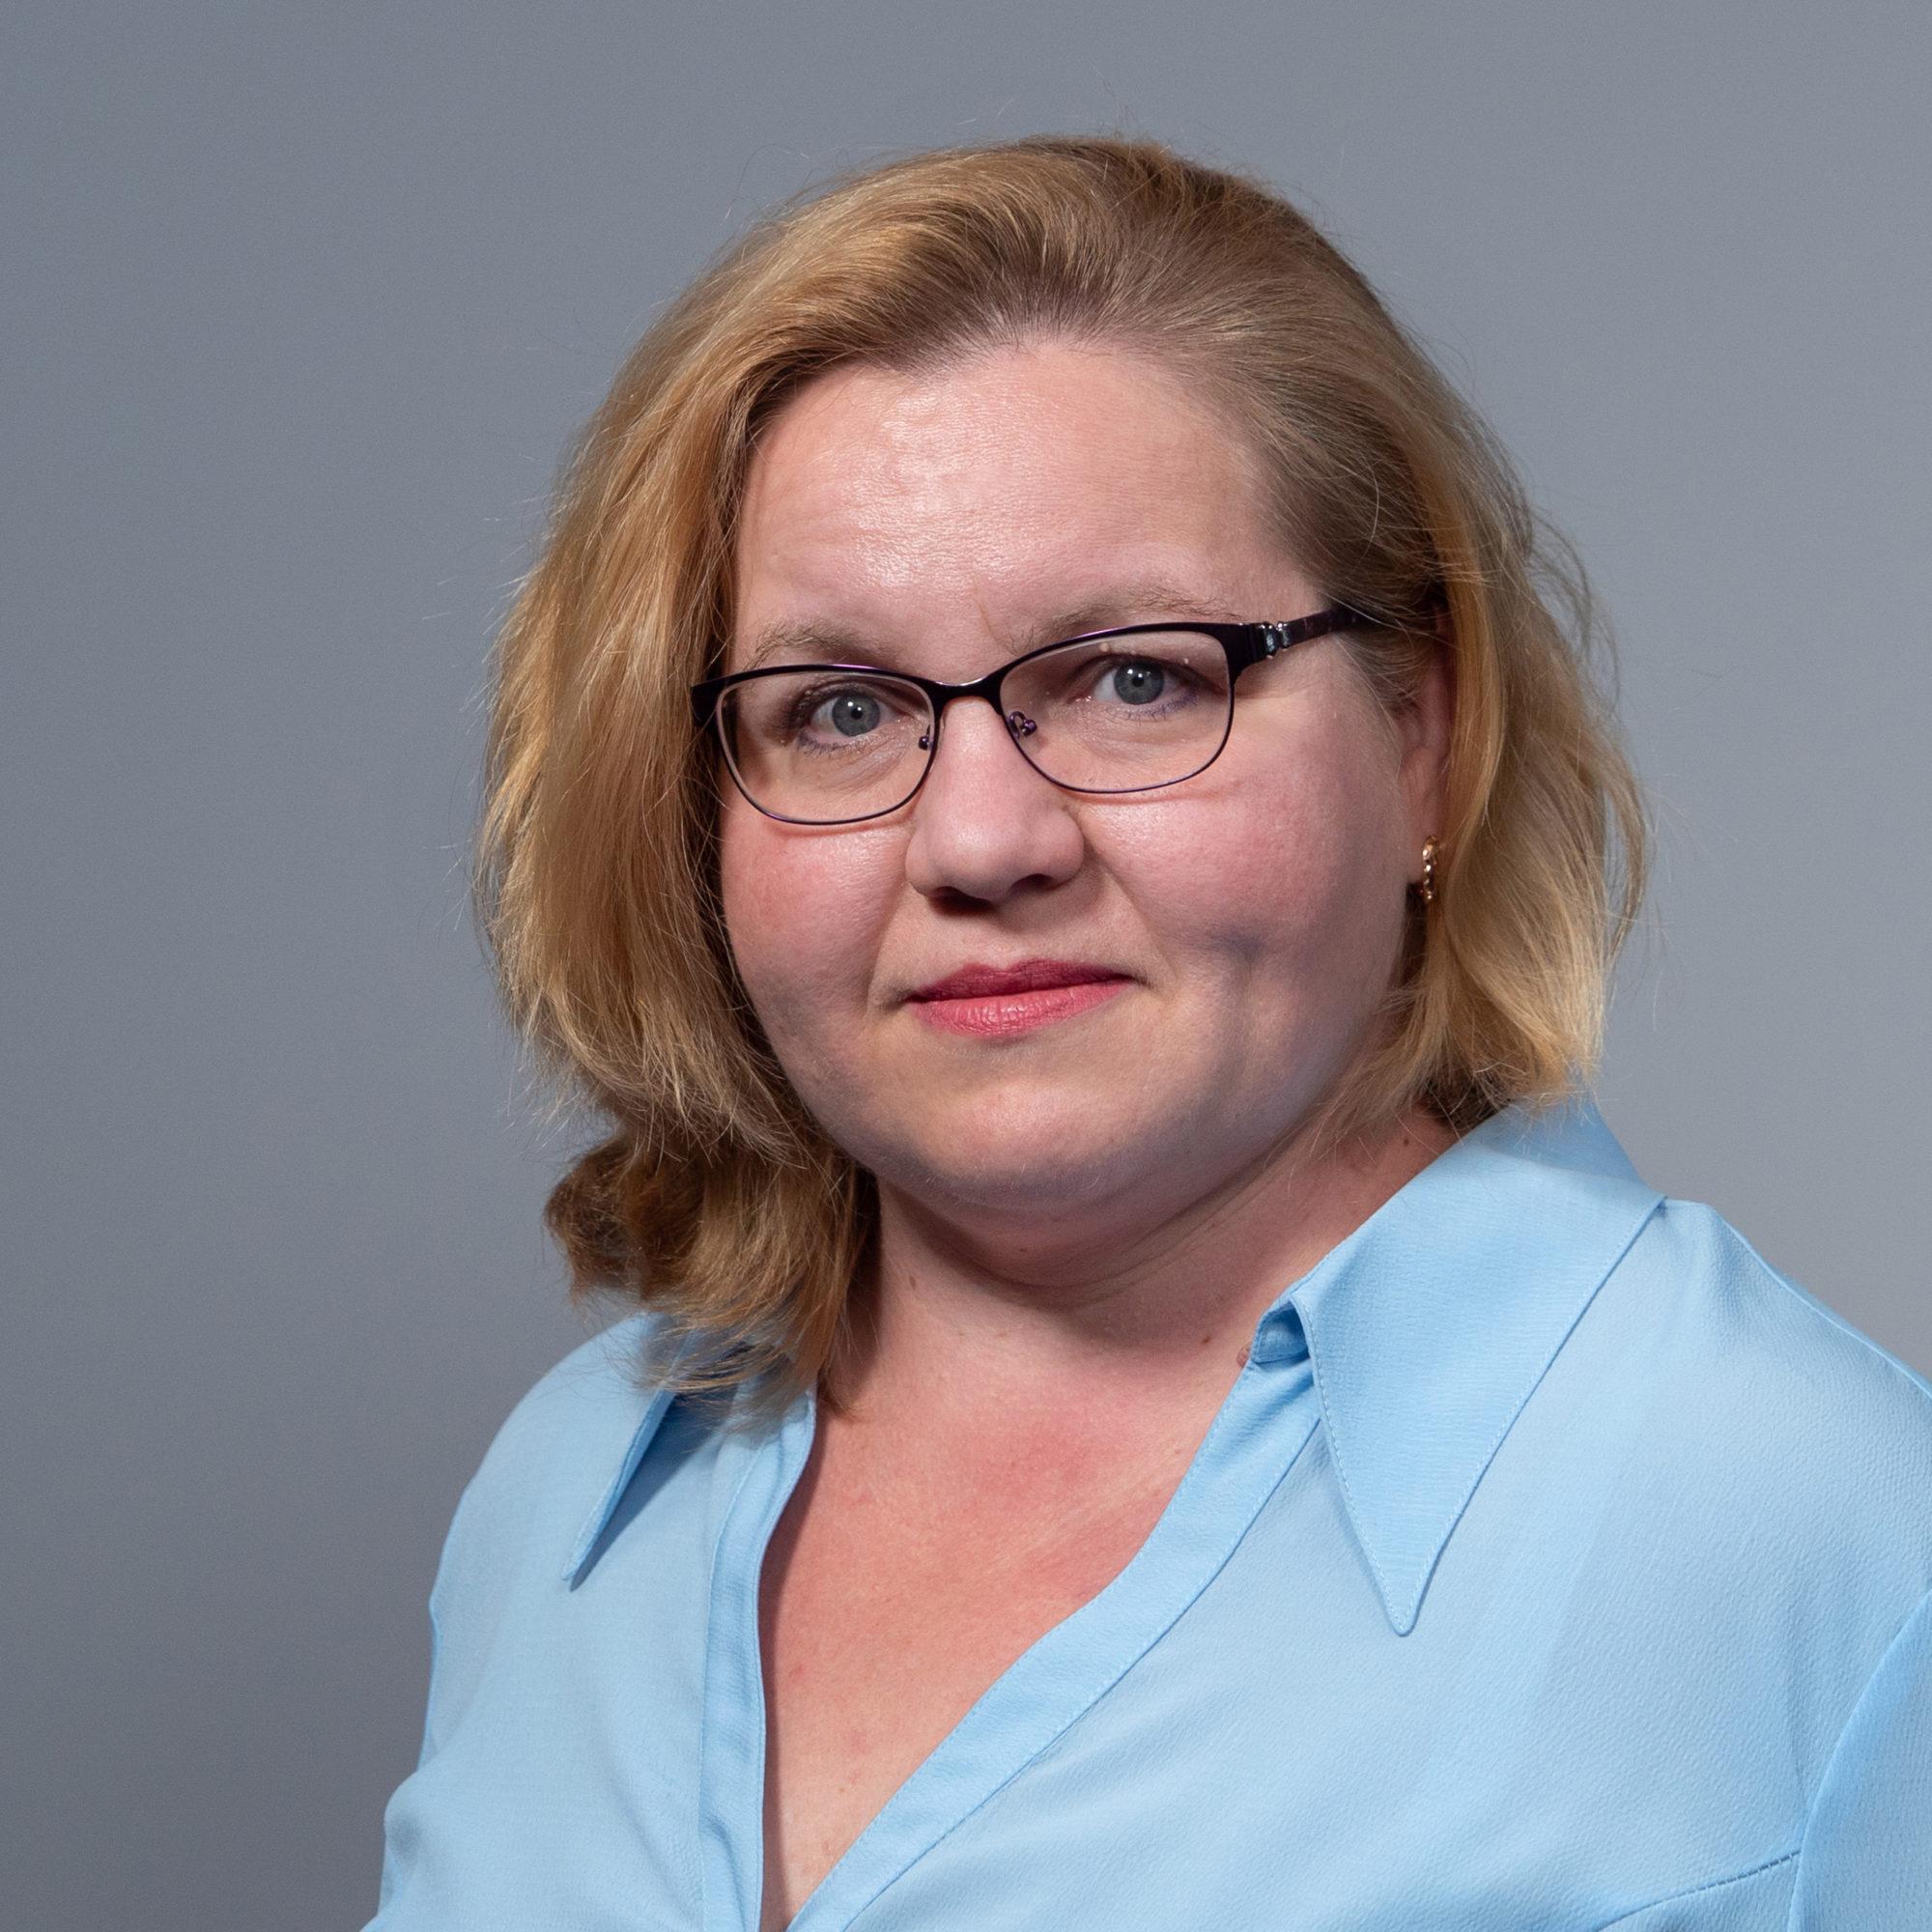 Лихачева Татьяна Сергеевна